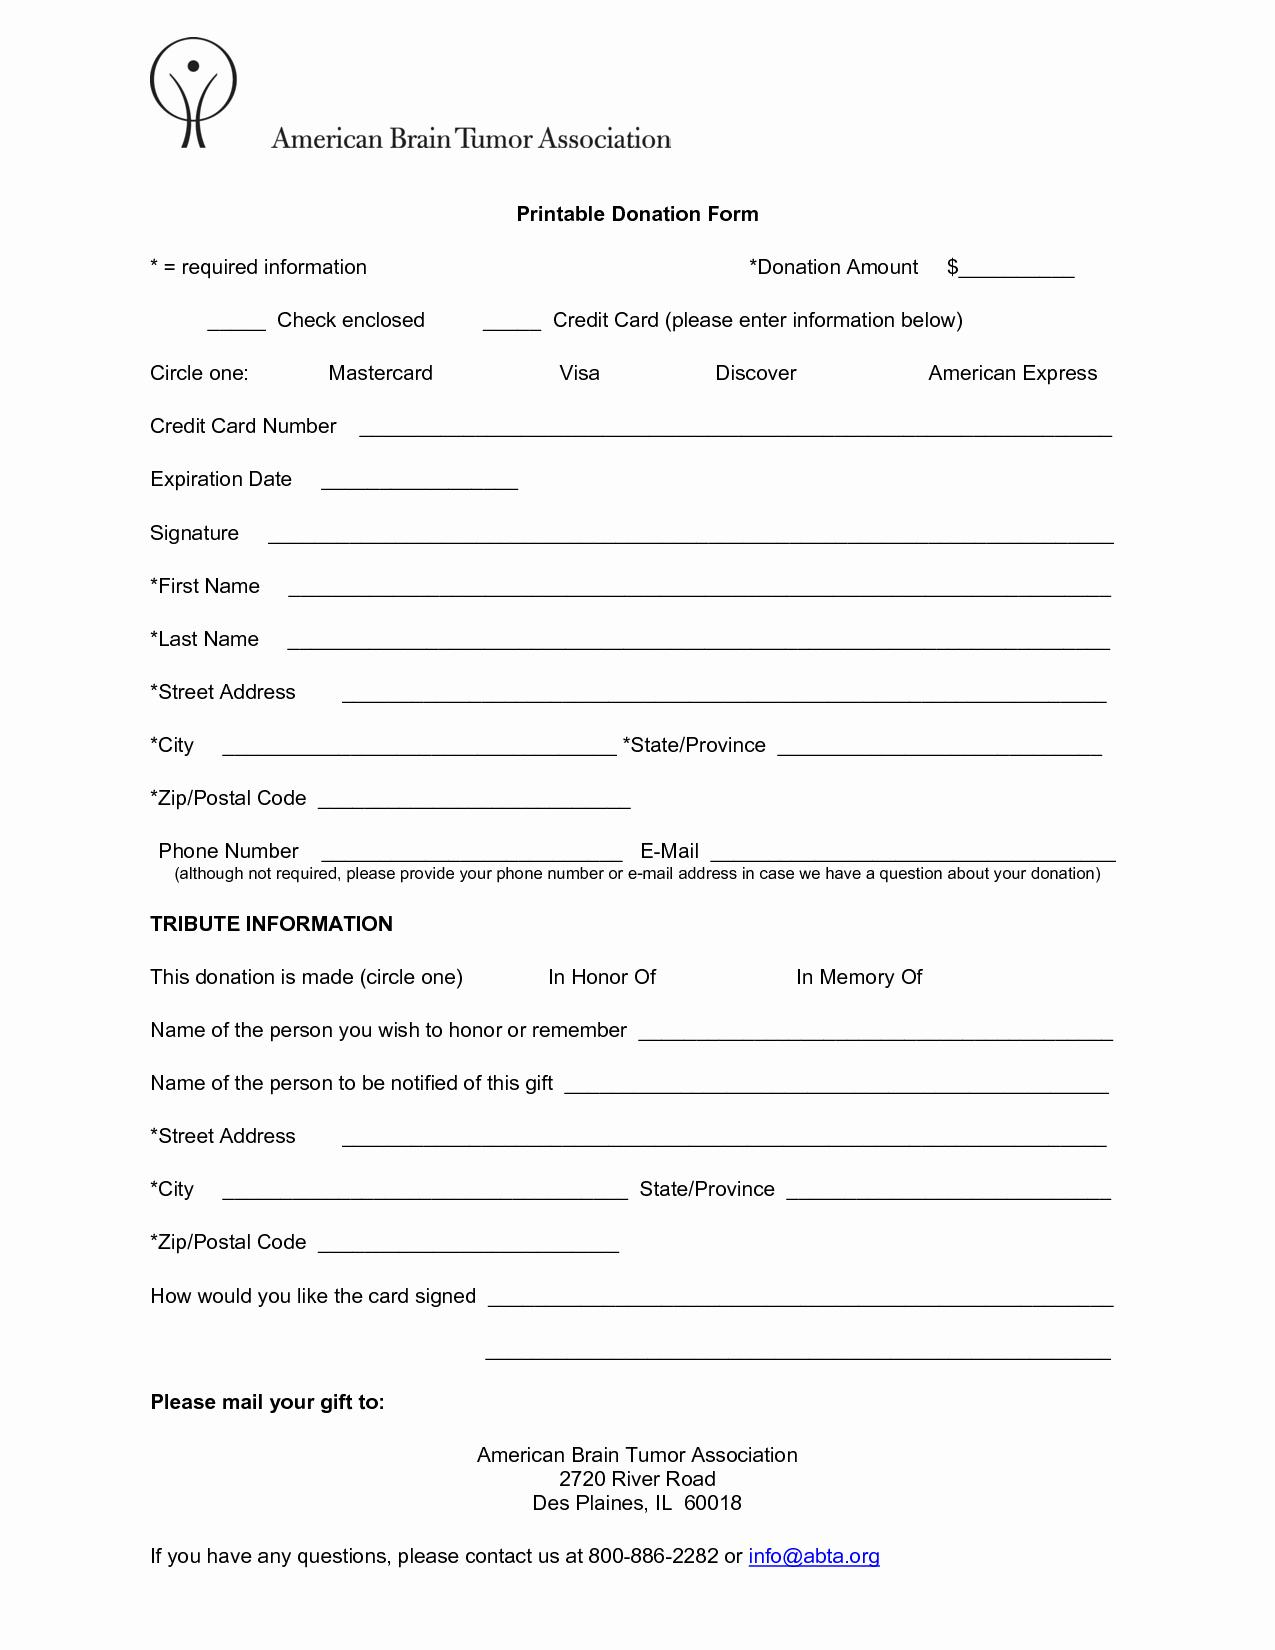 Printable Donation form Template Unique Donation forms Templates